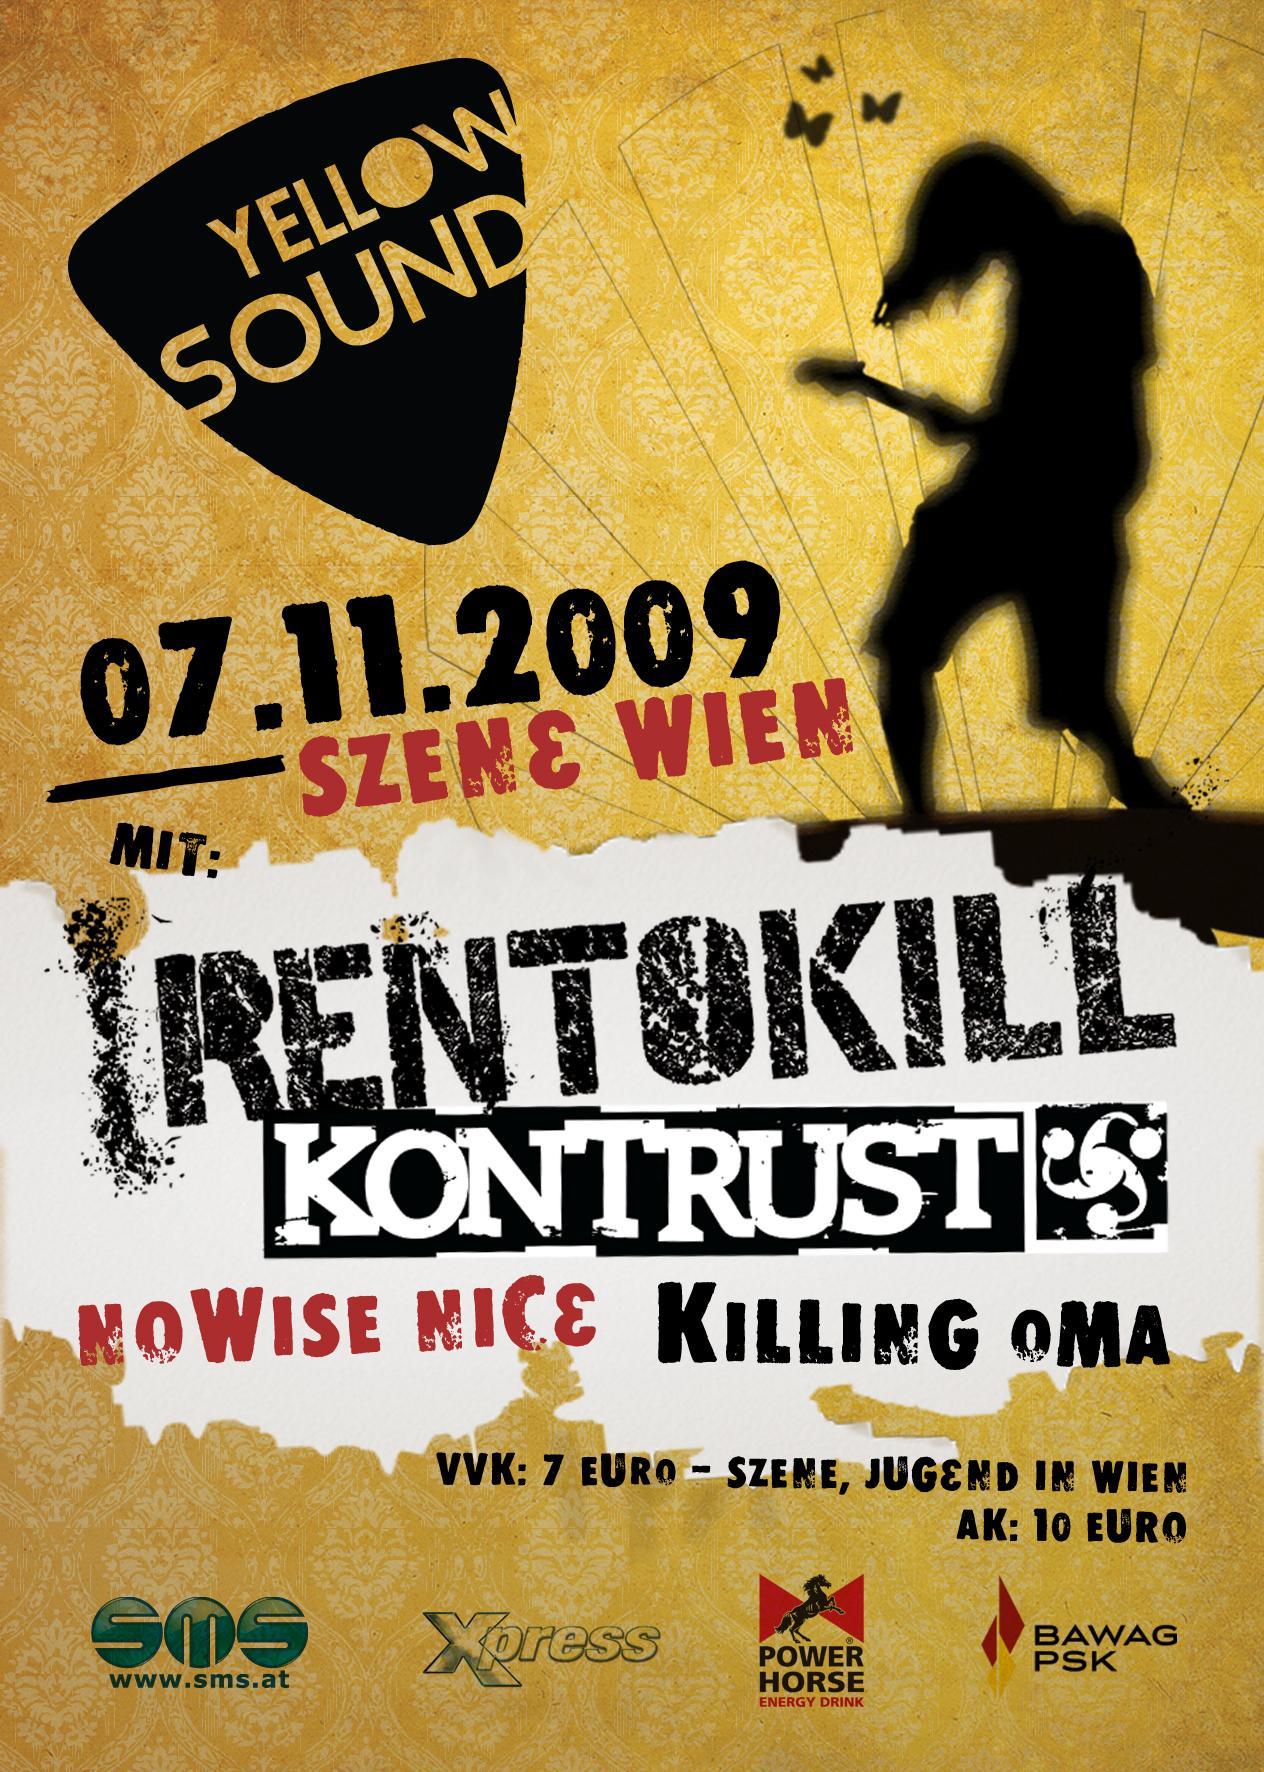 Yellowsound 2009 #3 @ Szene Wien